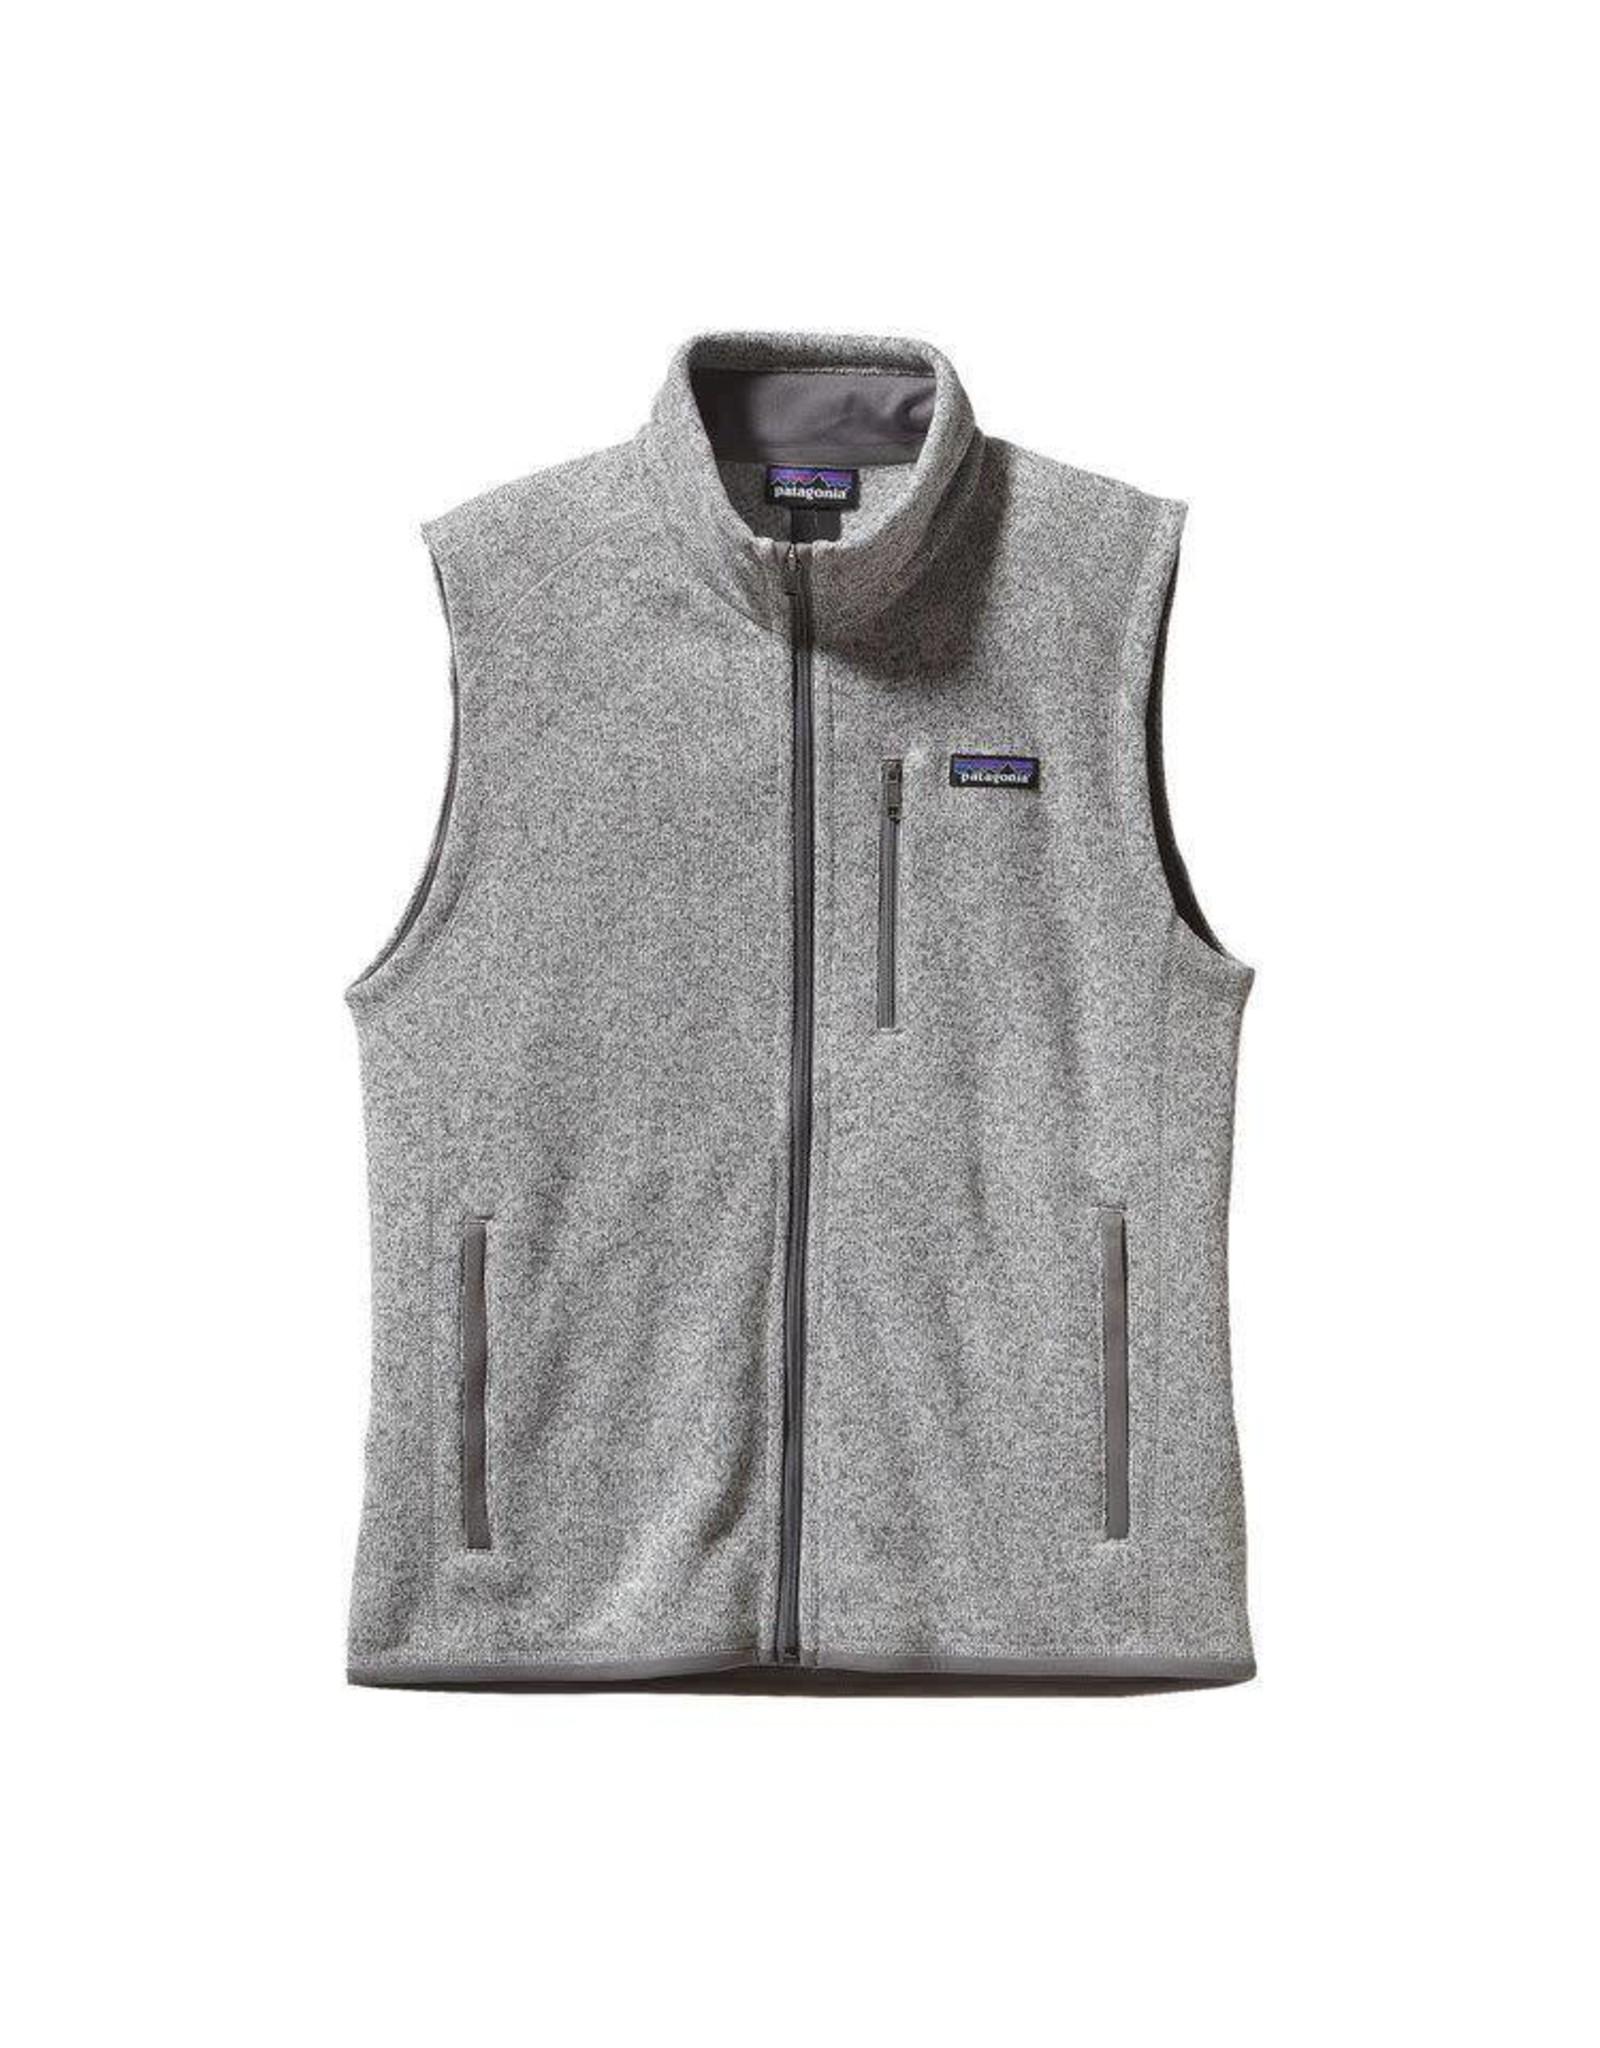 Patagonia Patagonia Better Sweater Vest, Mens